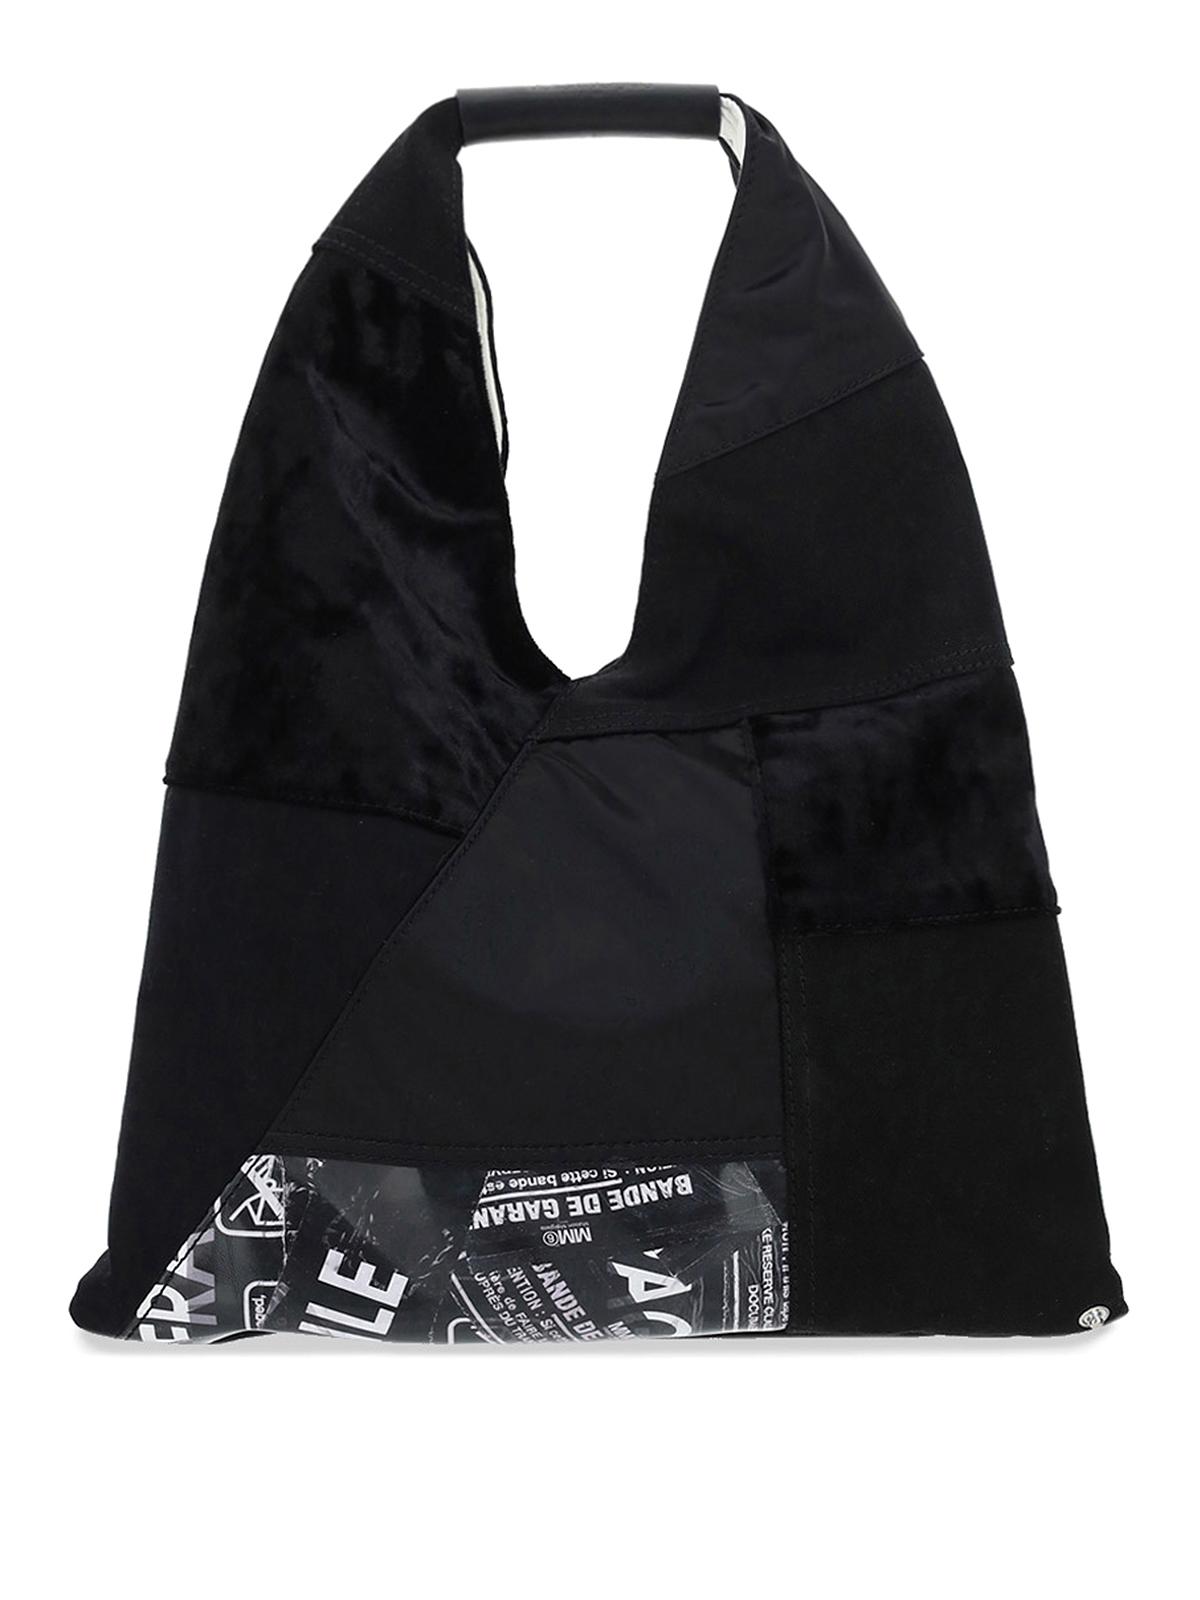 Mm6 Maison Margiela Leathers JAPANESE PATCHWORK TOTE BAG